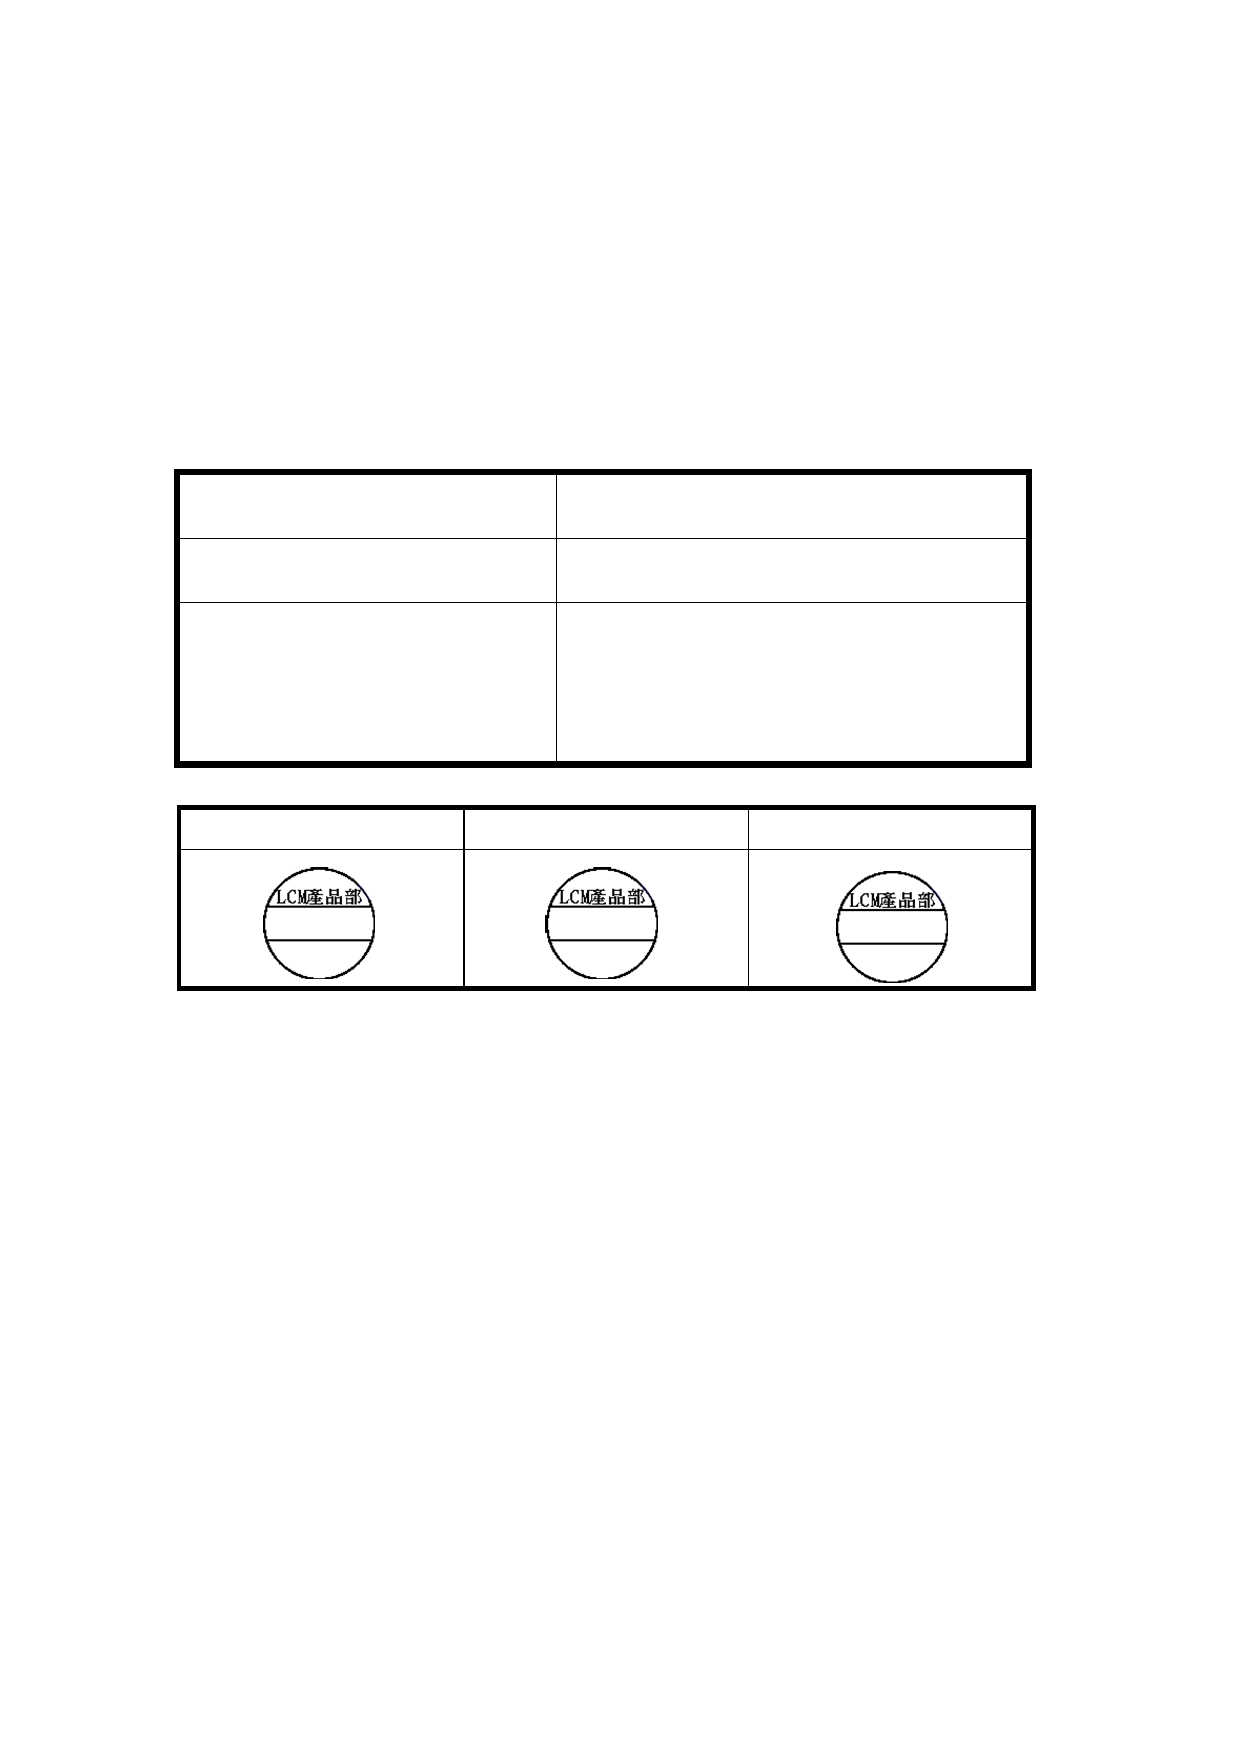 I1513-6SEN1212A datasheet